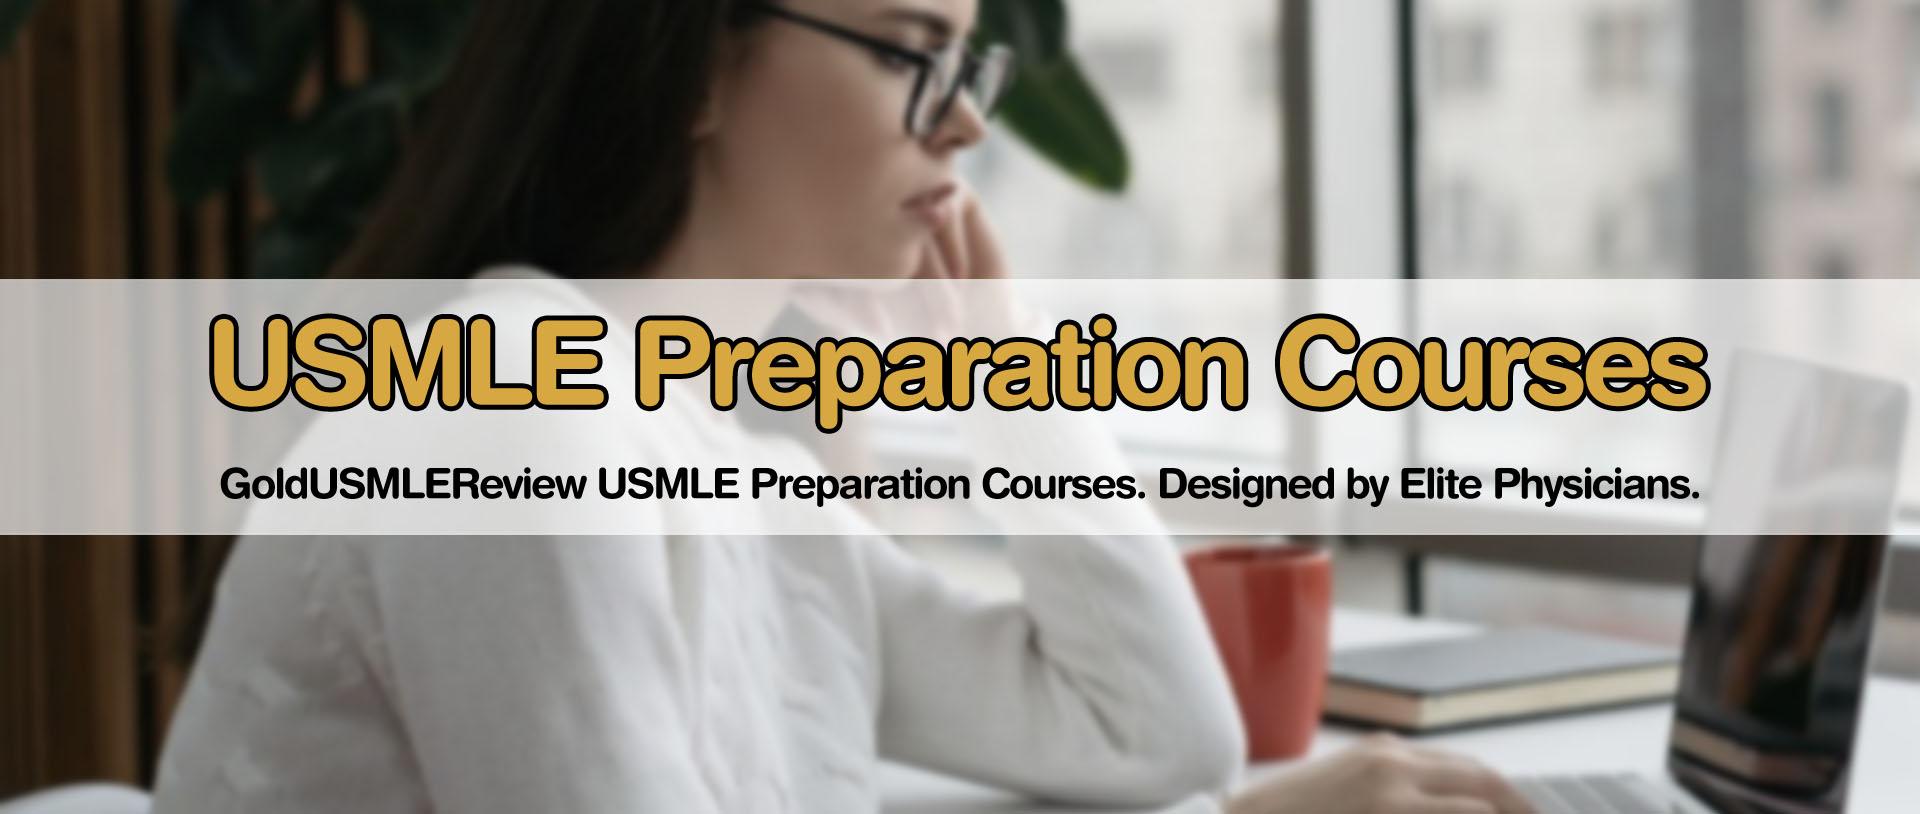 USMLE Preparation Courses